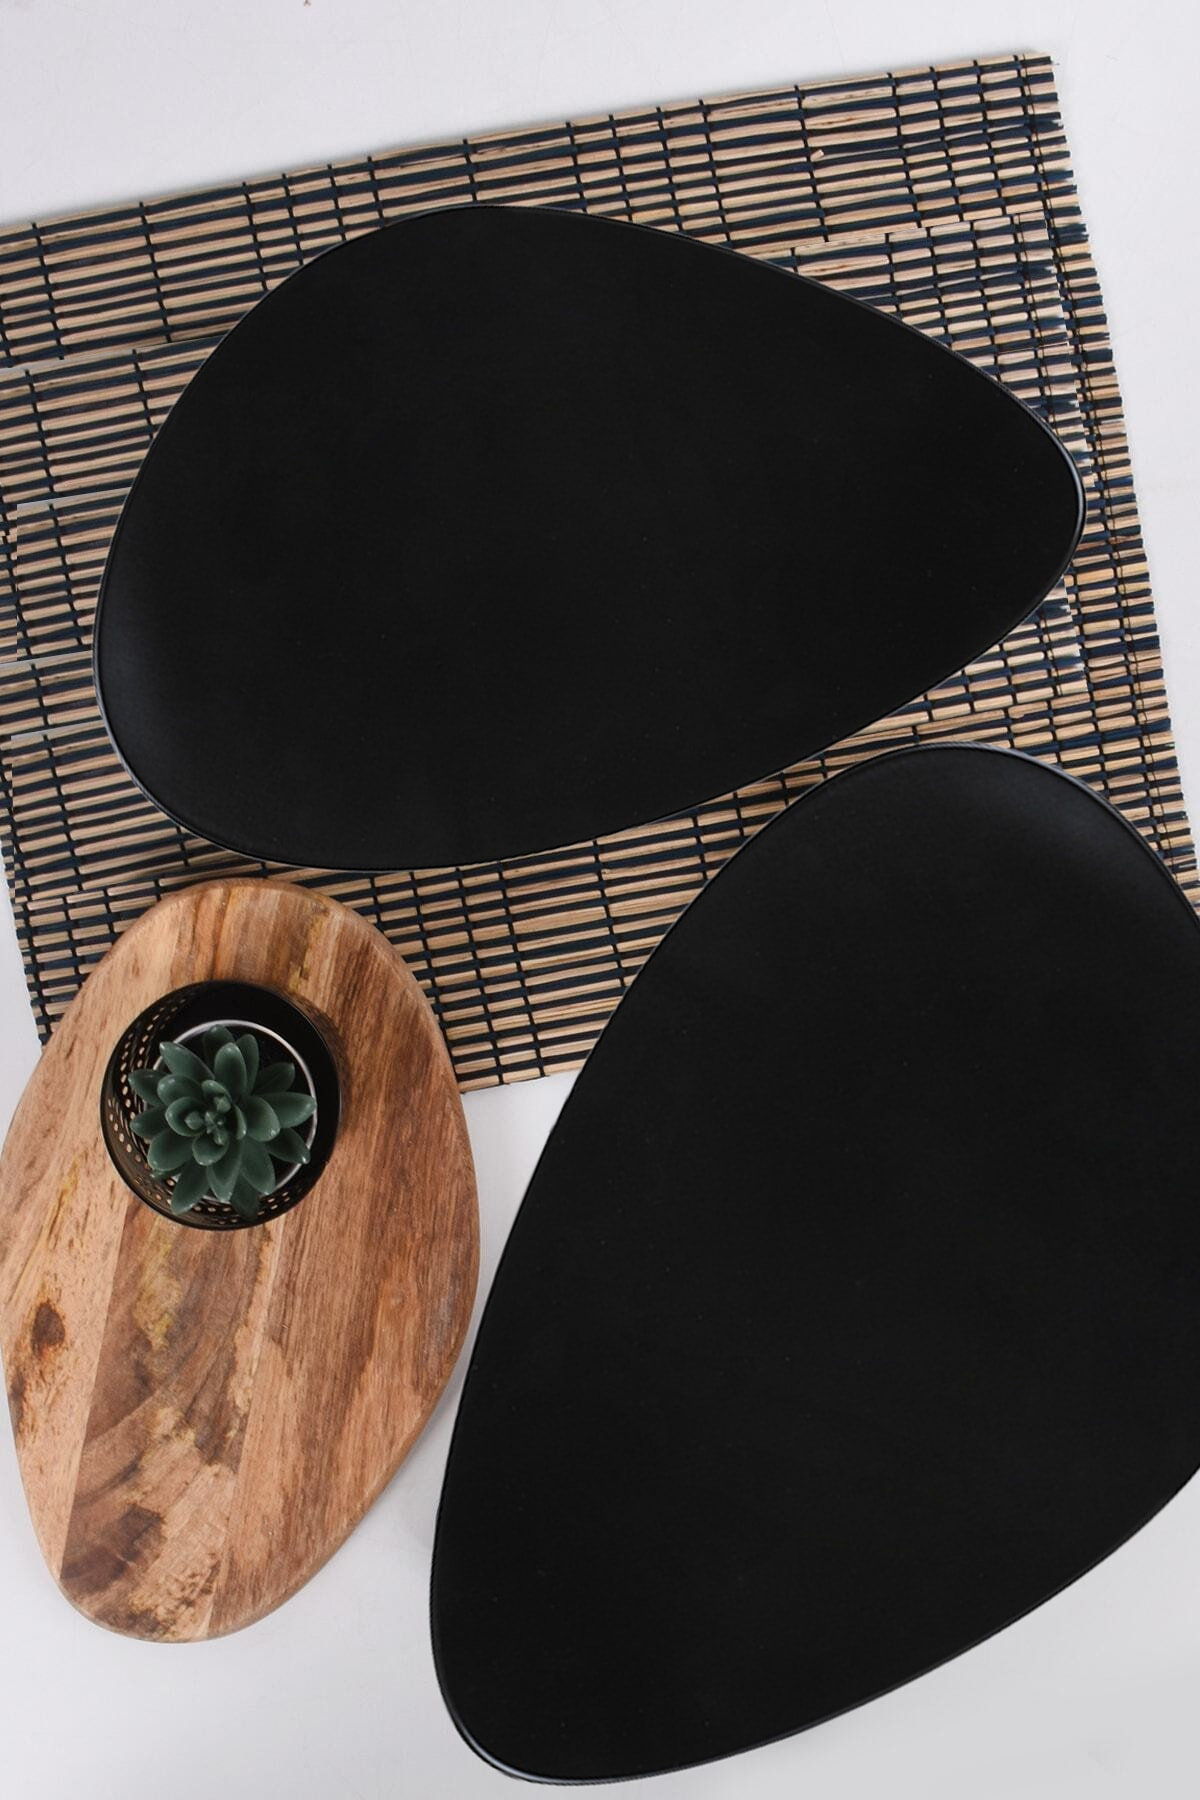 Siyah Mat Oscar Servis Tabağı 35 Cm 2 Adet